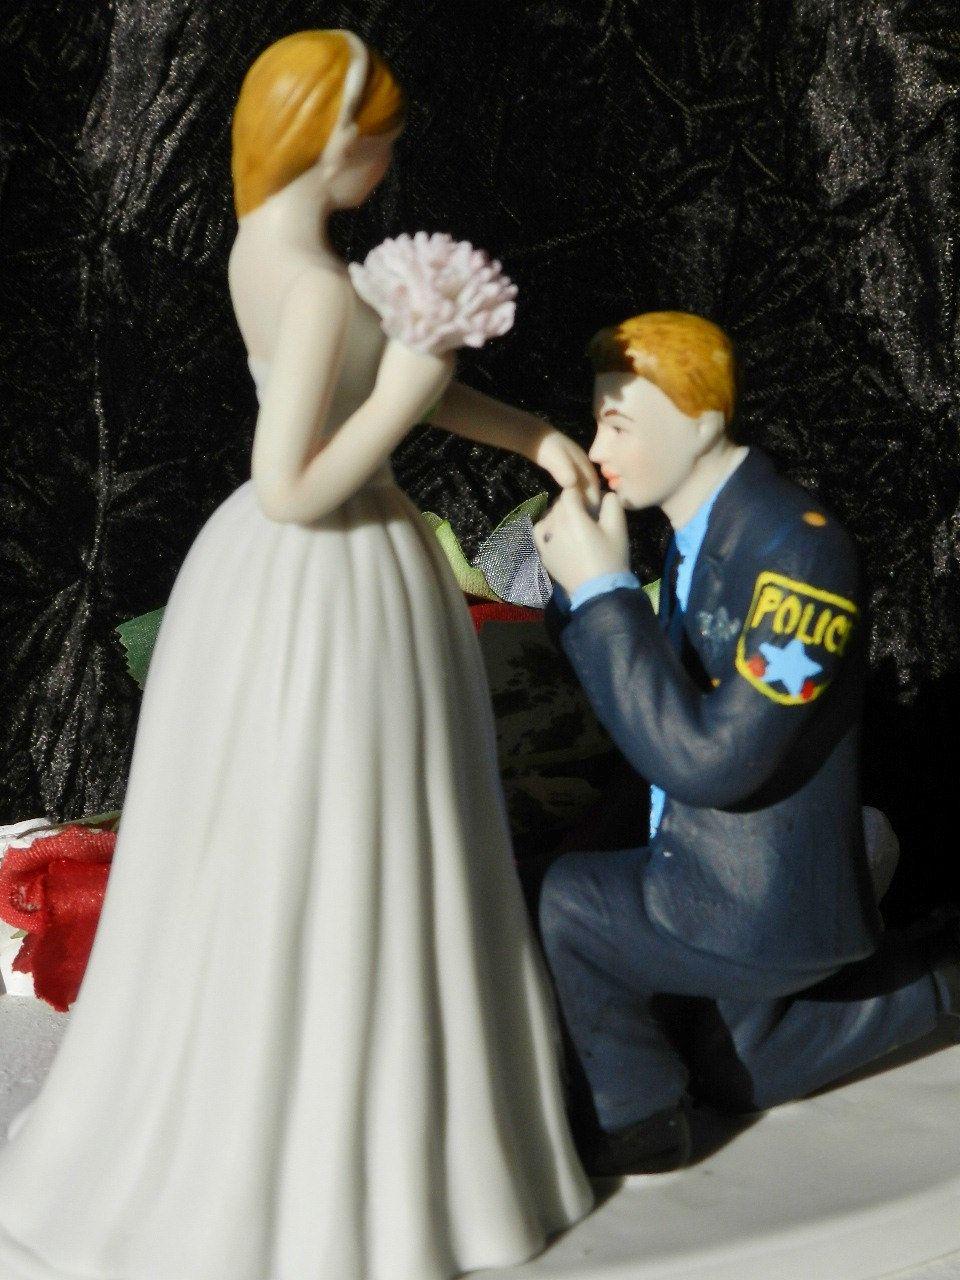 Police Officer Cop Groom Kiss Bride Hand Wedding Cake